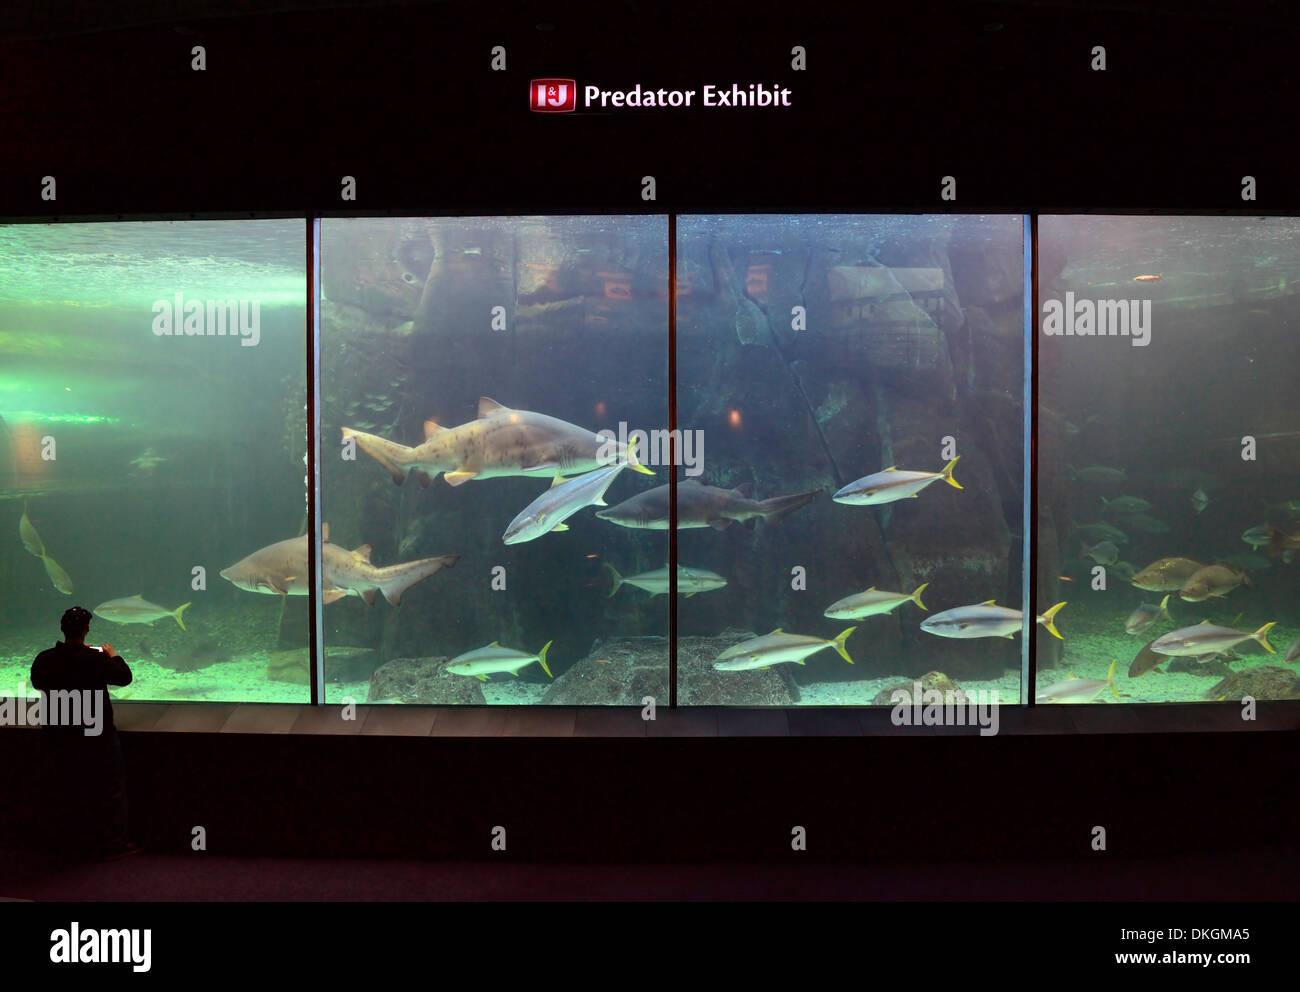 Freshwater aquarium fish cape town - Stock Photo Predator Exhibit Exhibition Two Oceans Aquarium Cape Town South Africa Shark Carnivorous Fish Carnivores Man Watching